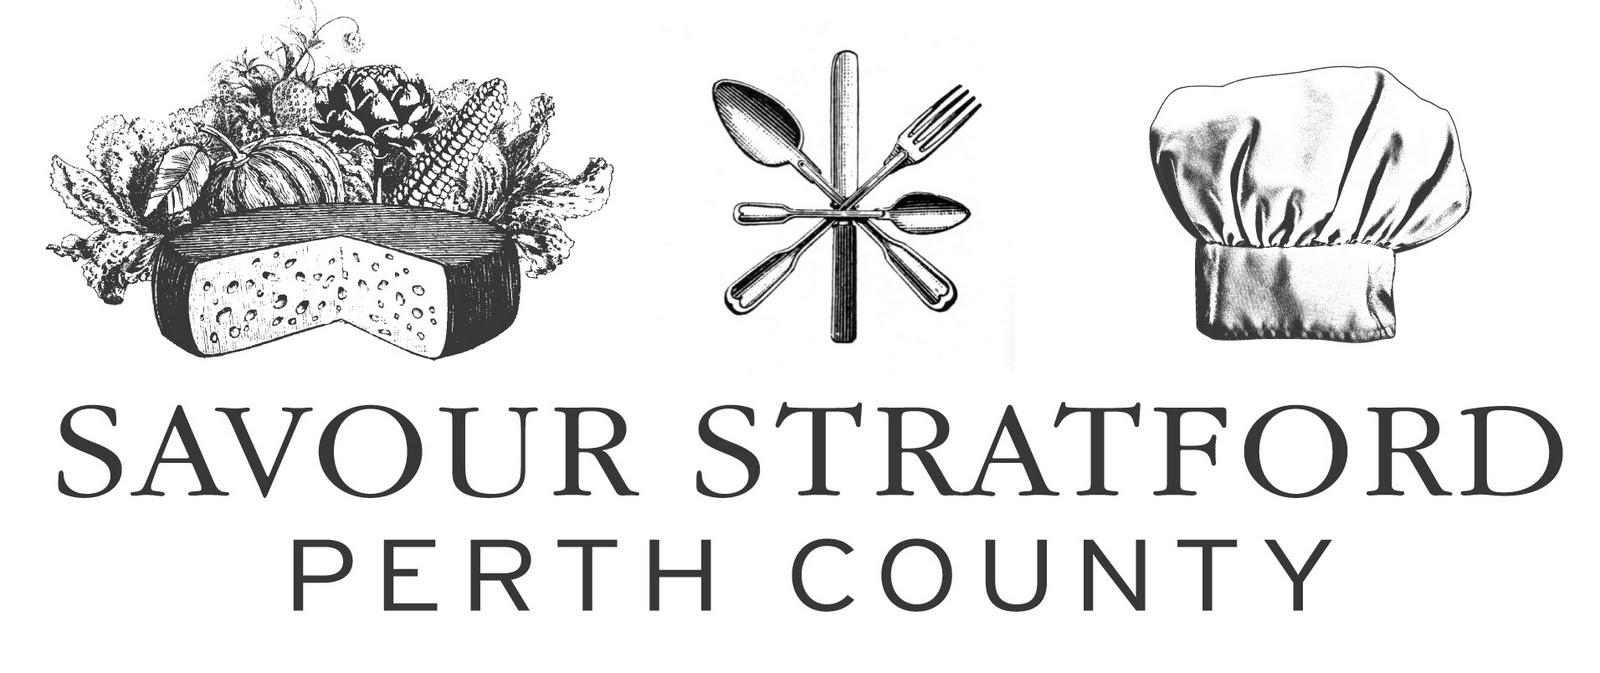 00 Savour Stratford Logo